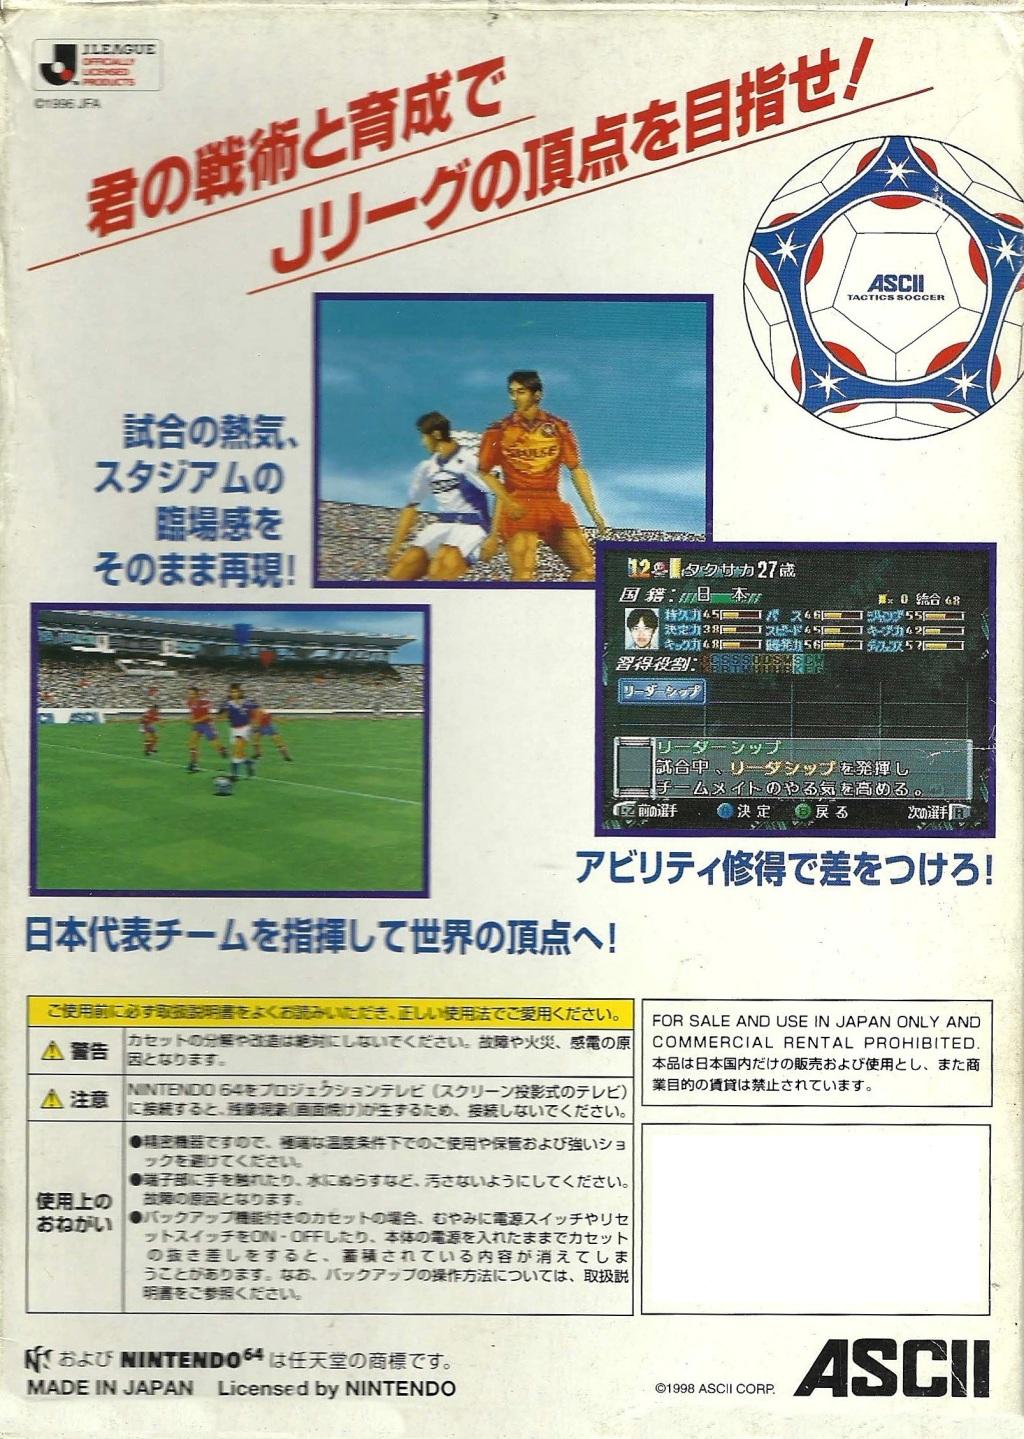 Back boxart of the game J.League Tactics Soccer (Japan) on Nintendo 64